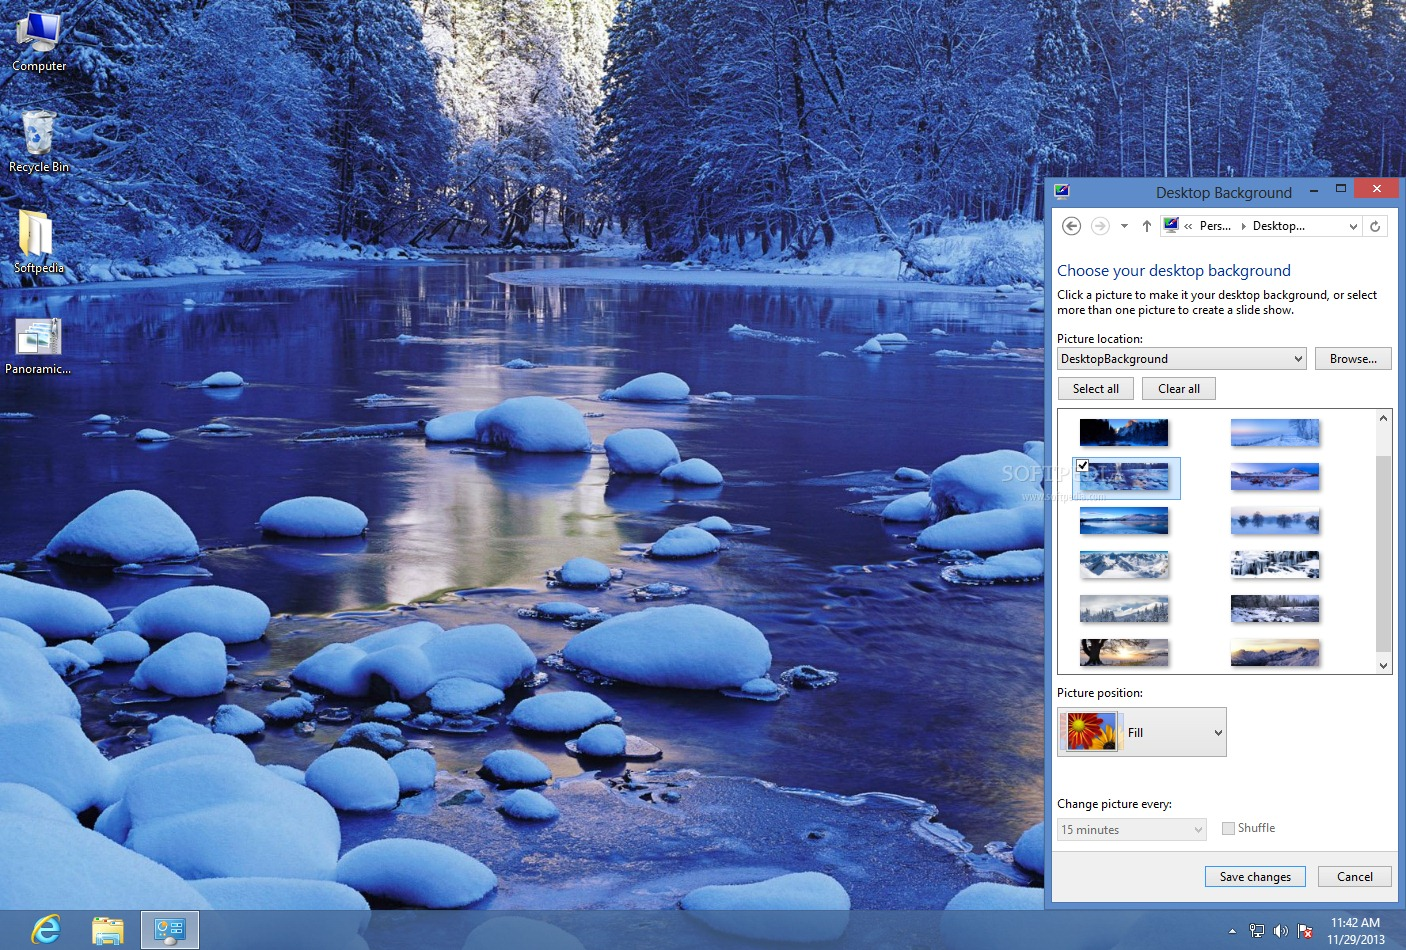 pdf creator for windows 8 64 bit free download